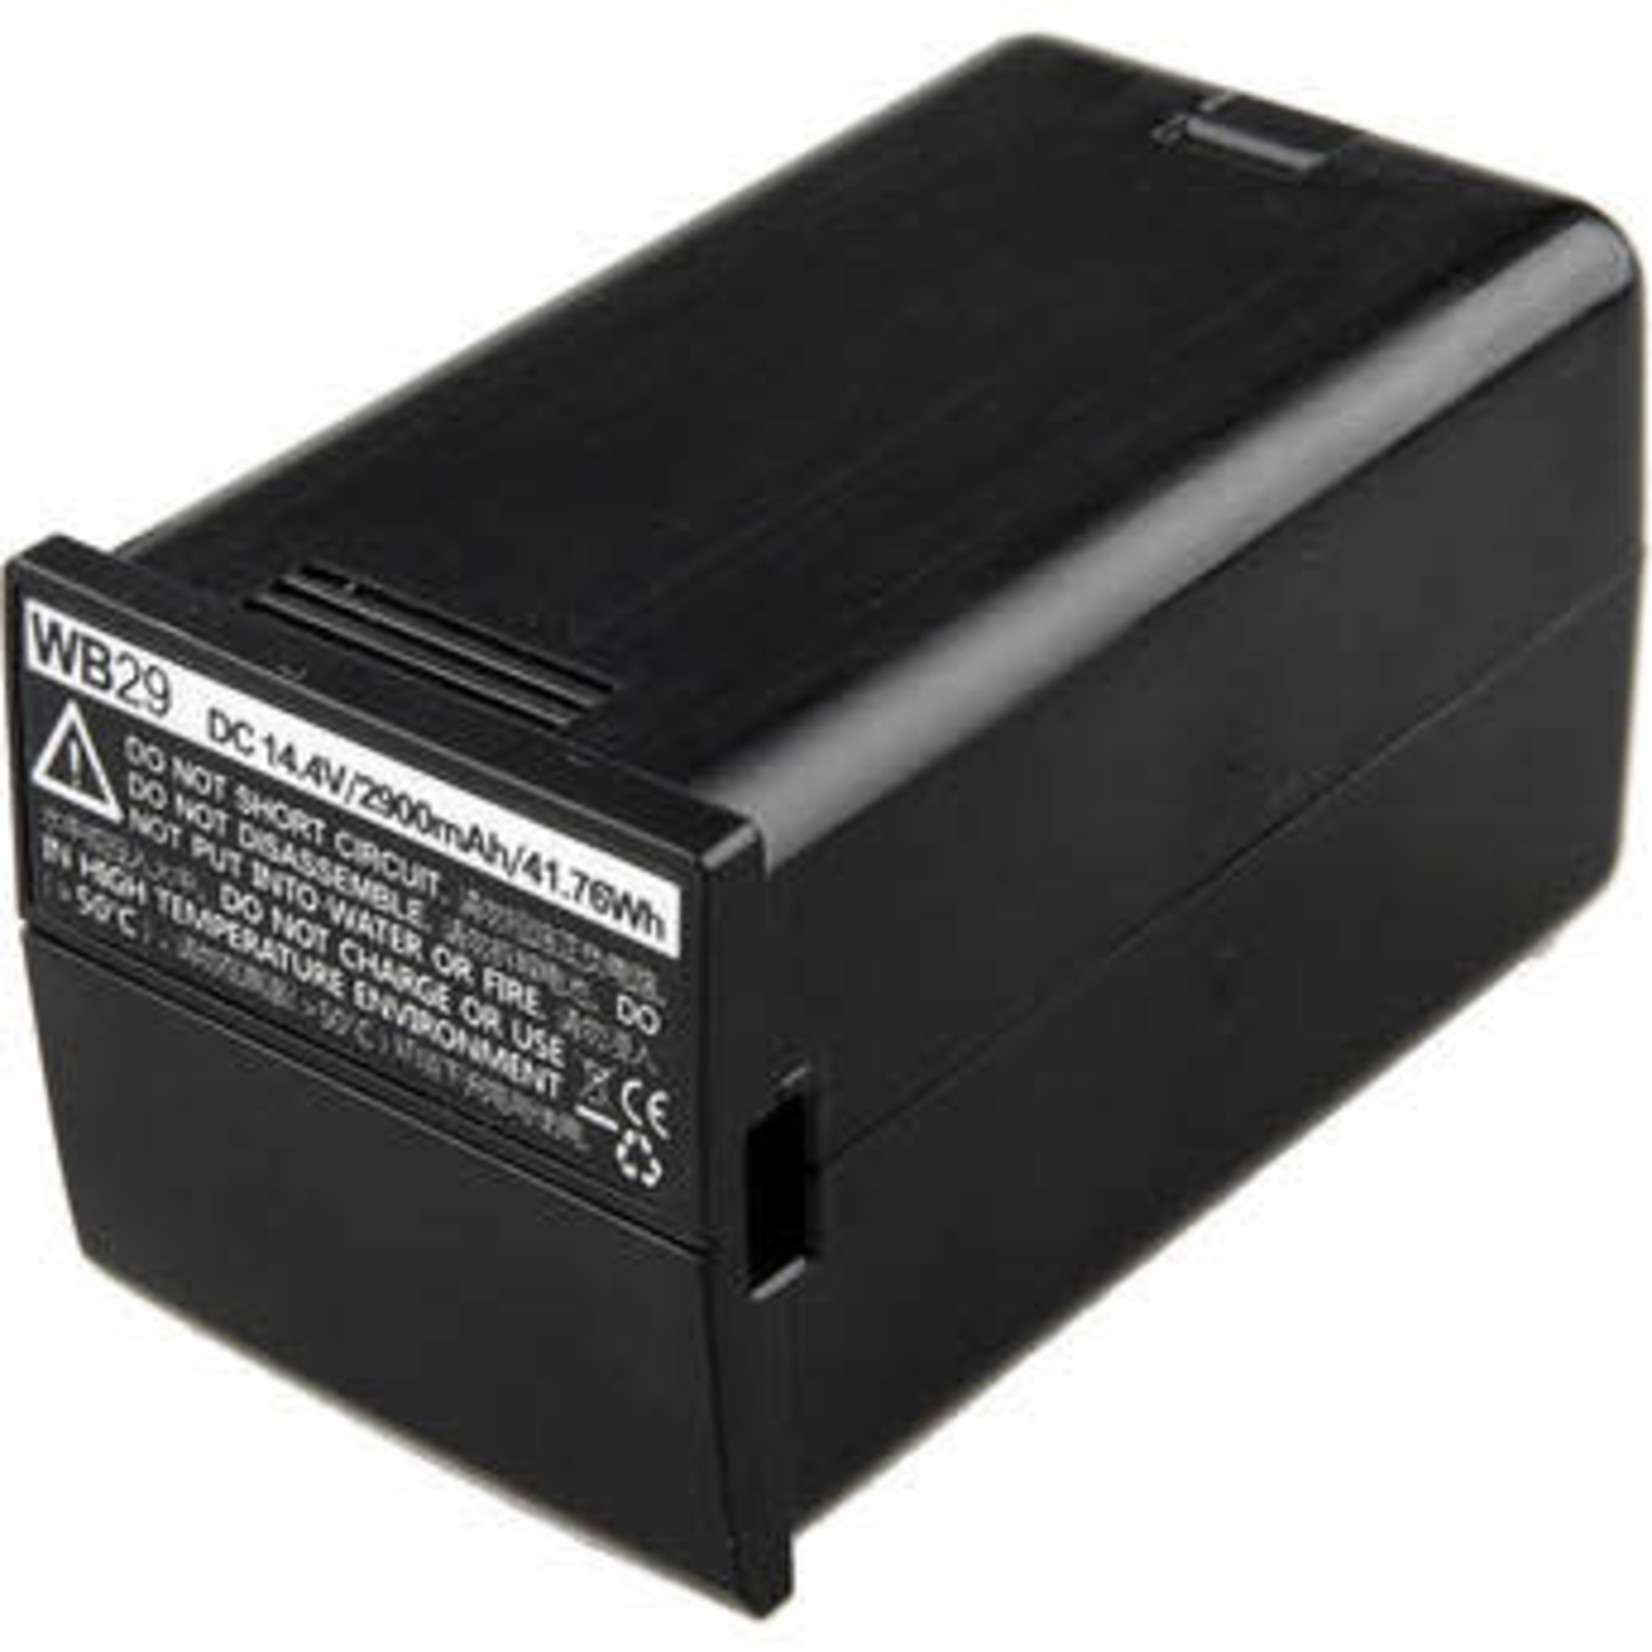 Godox GodoxAD200 WB-29 Battery (Included in Kit)